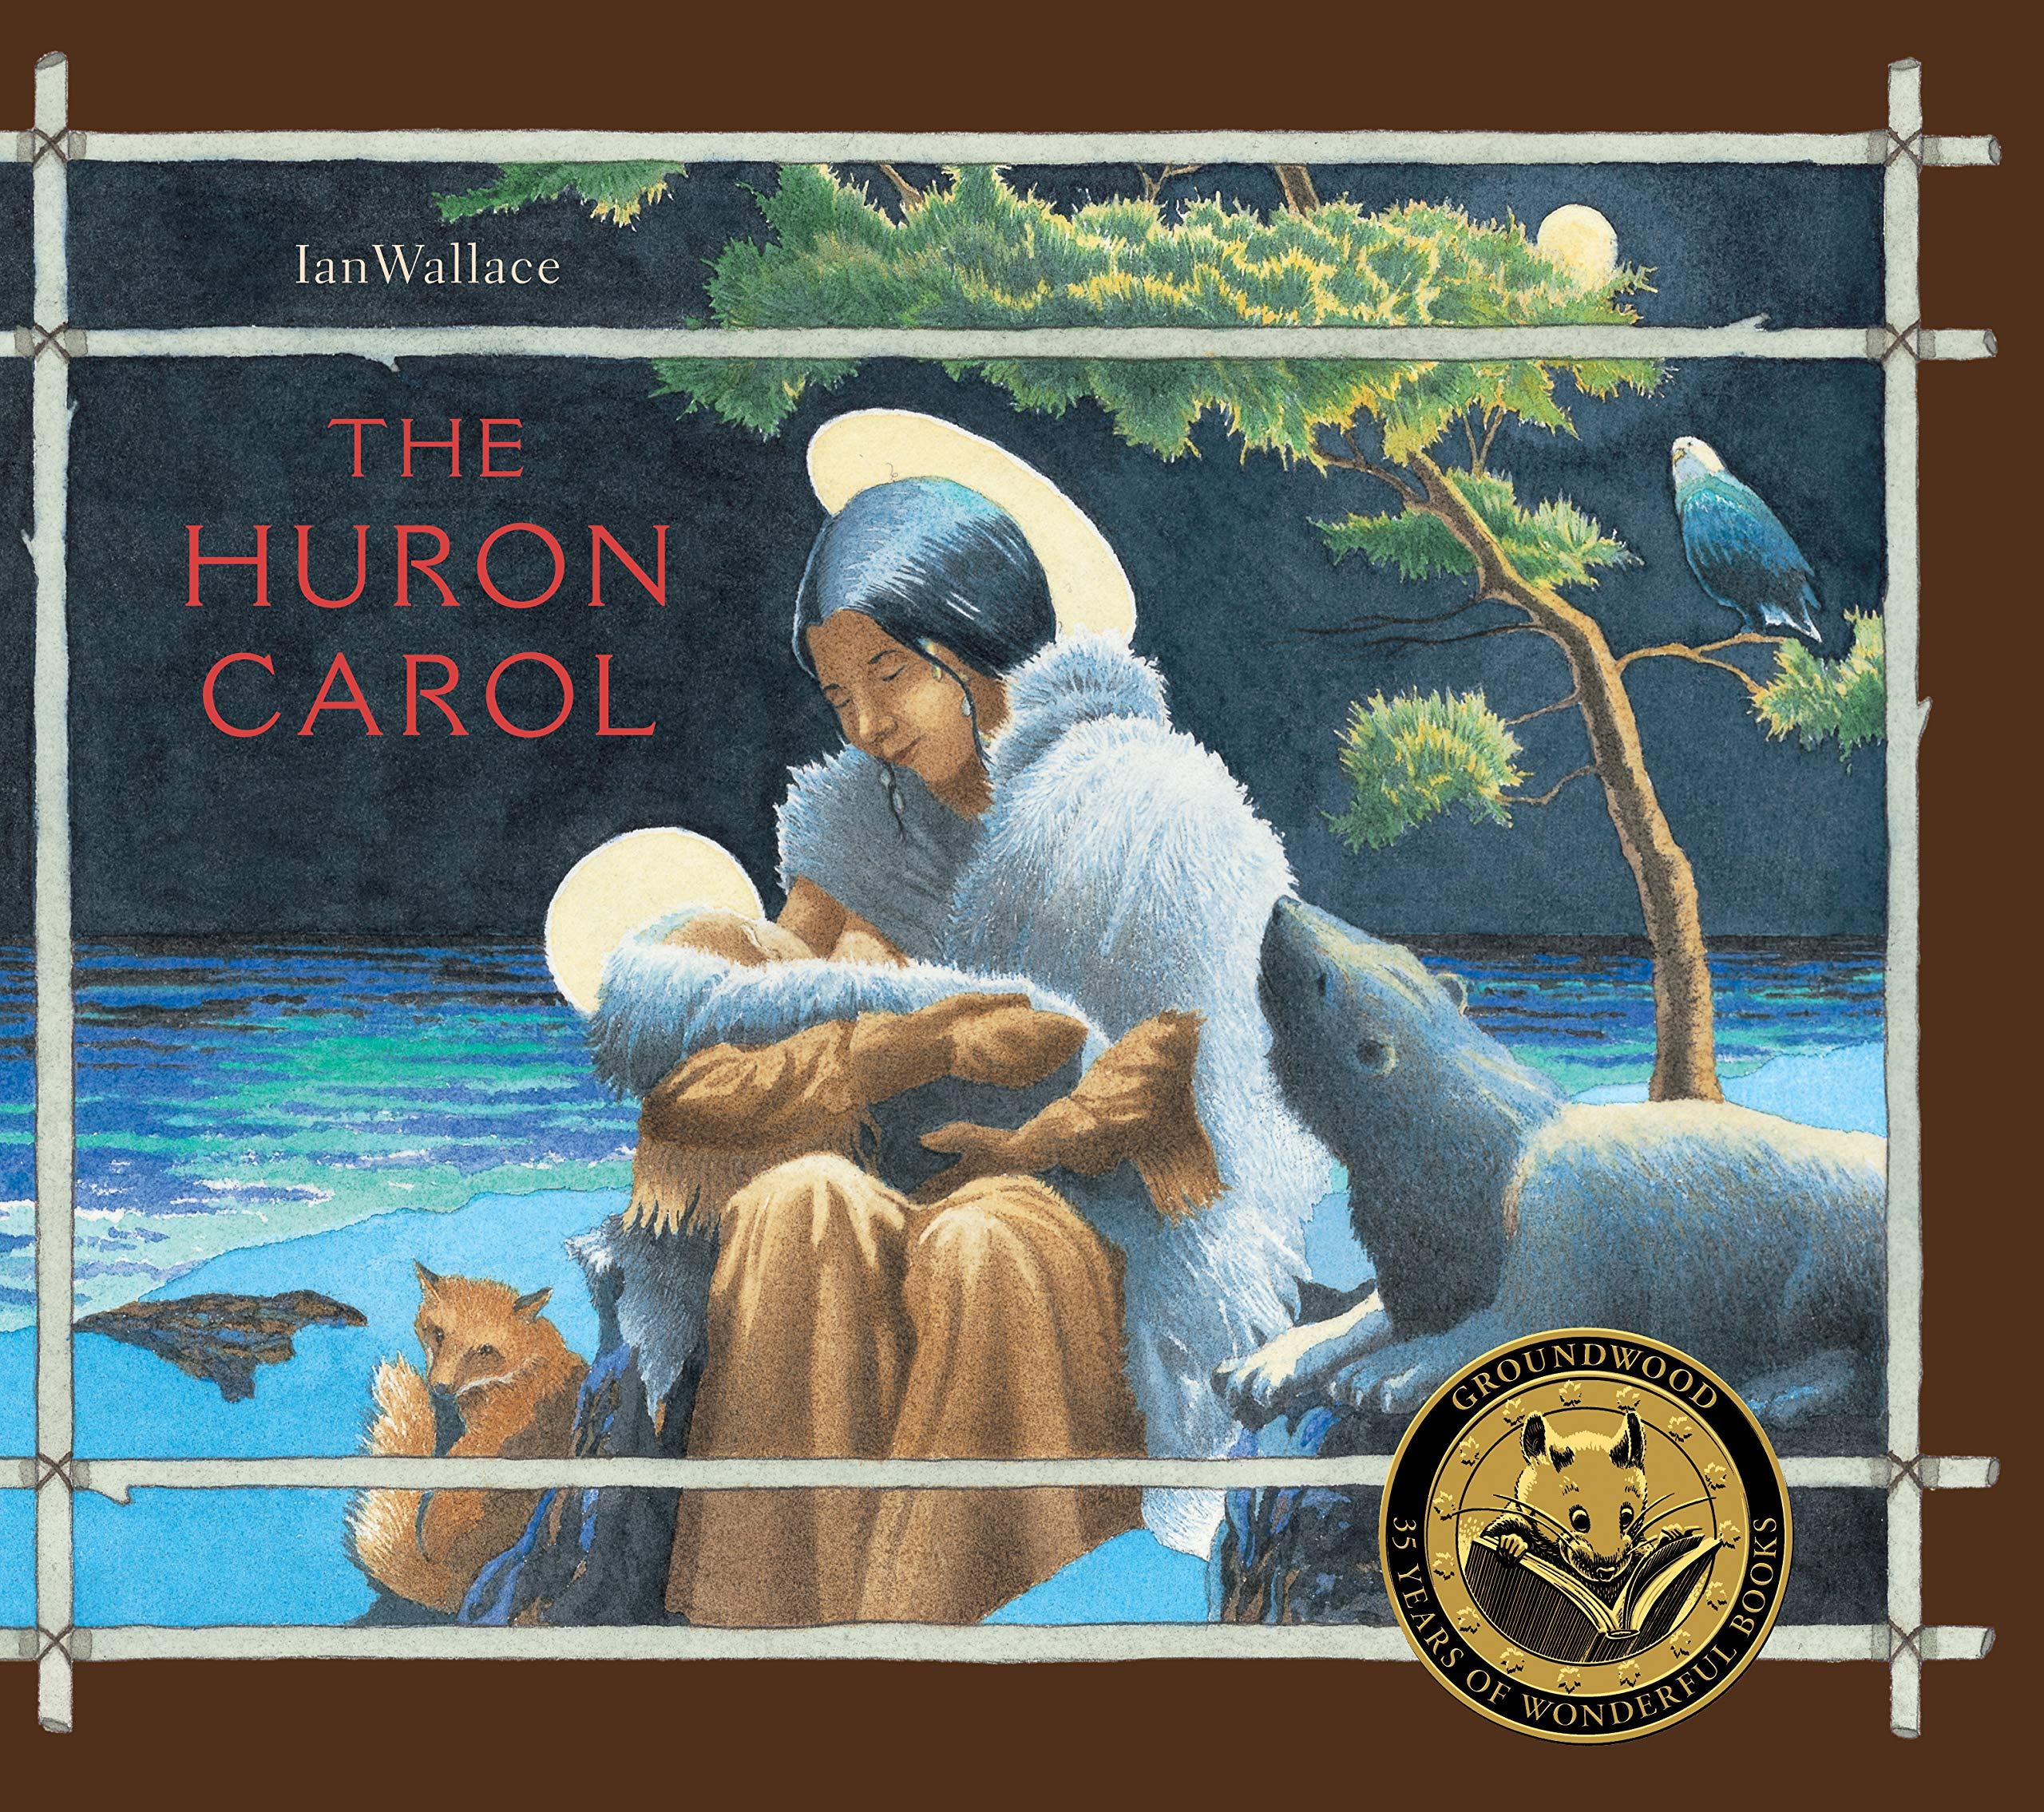 The Huron Carol